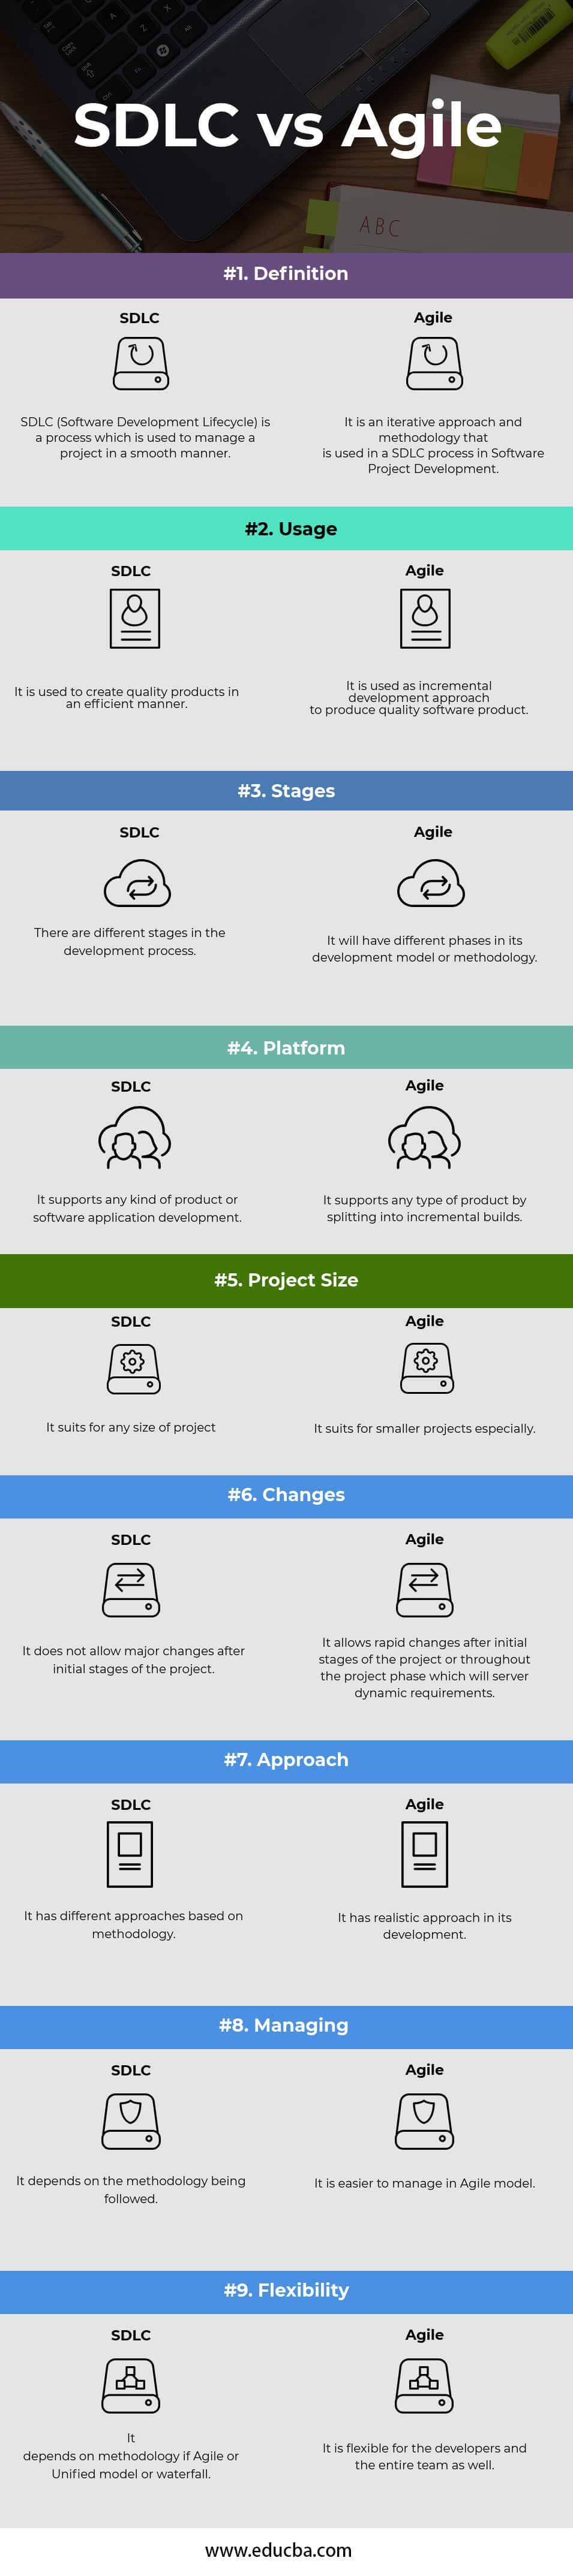 SDLC vs Agile Infographics